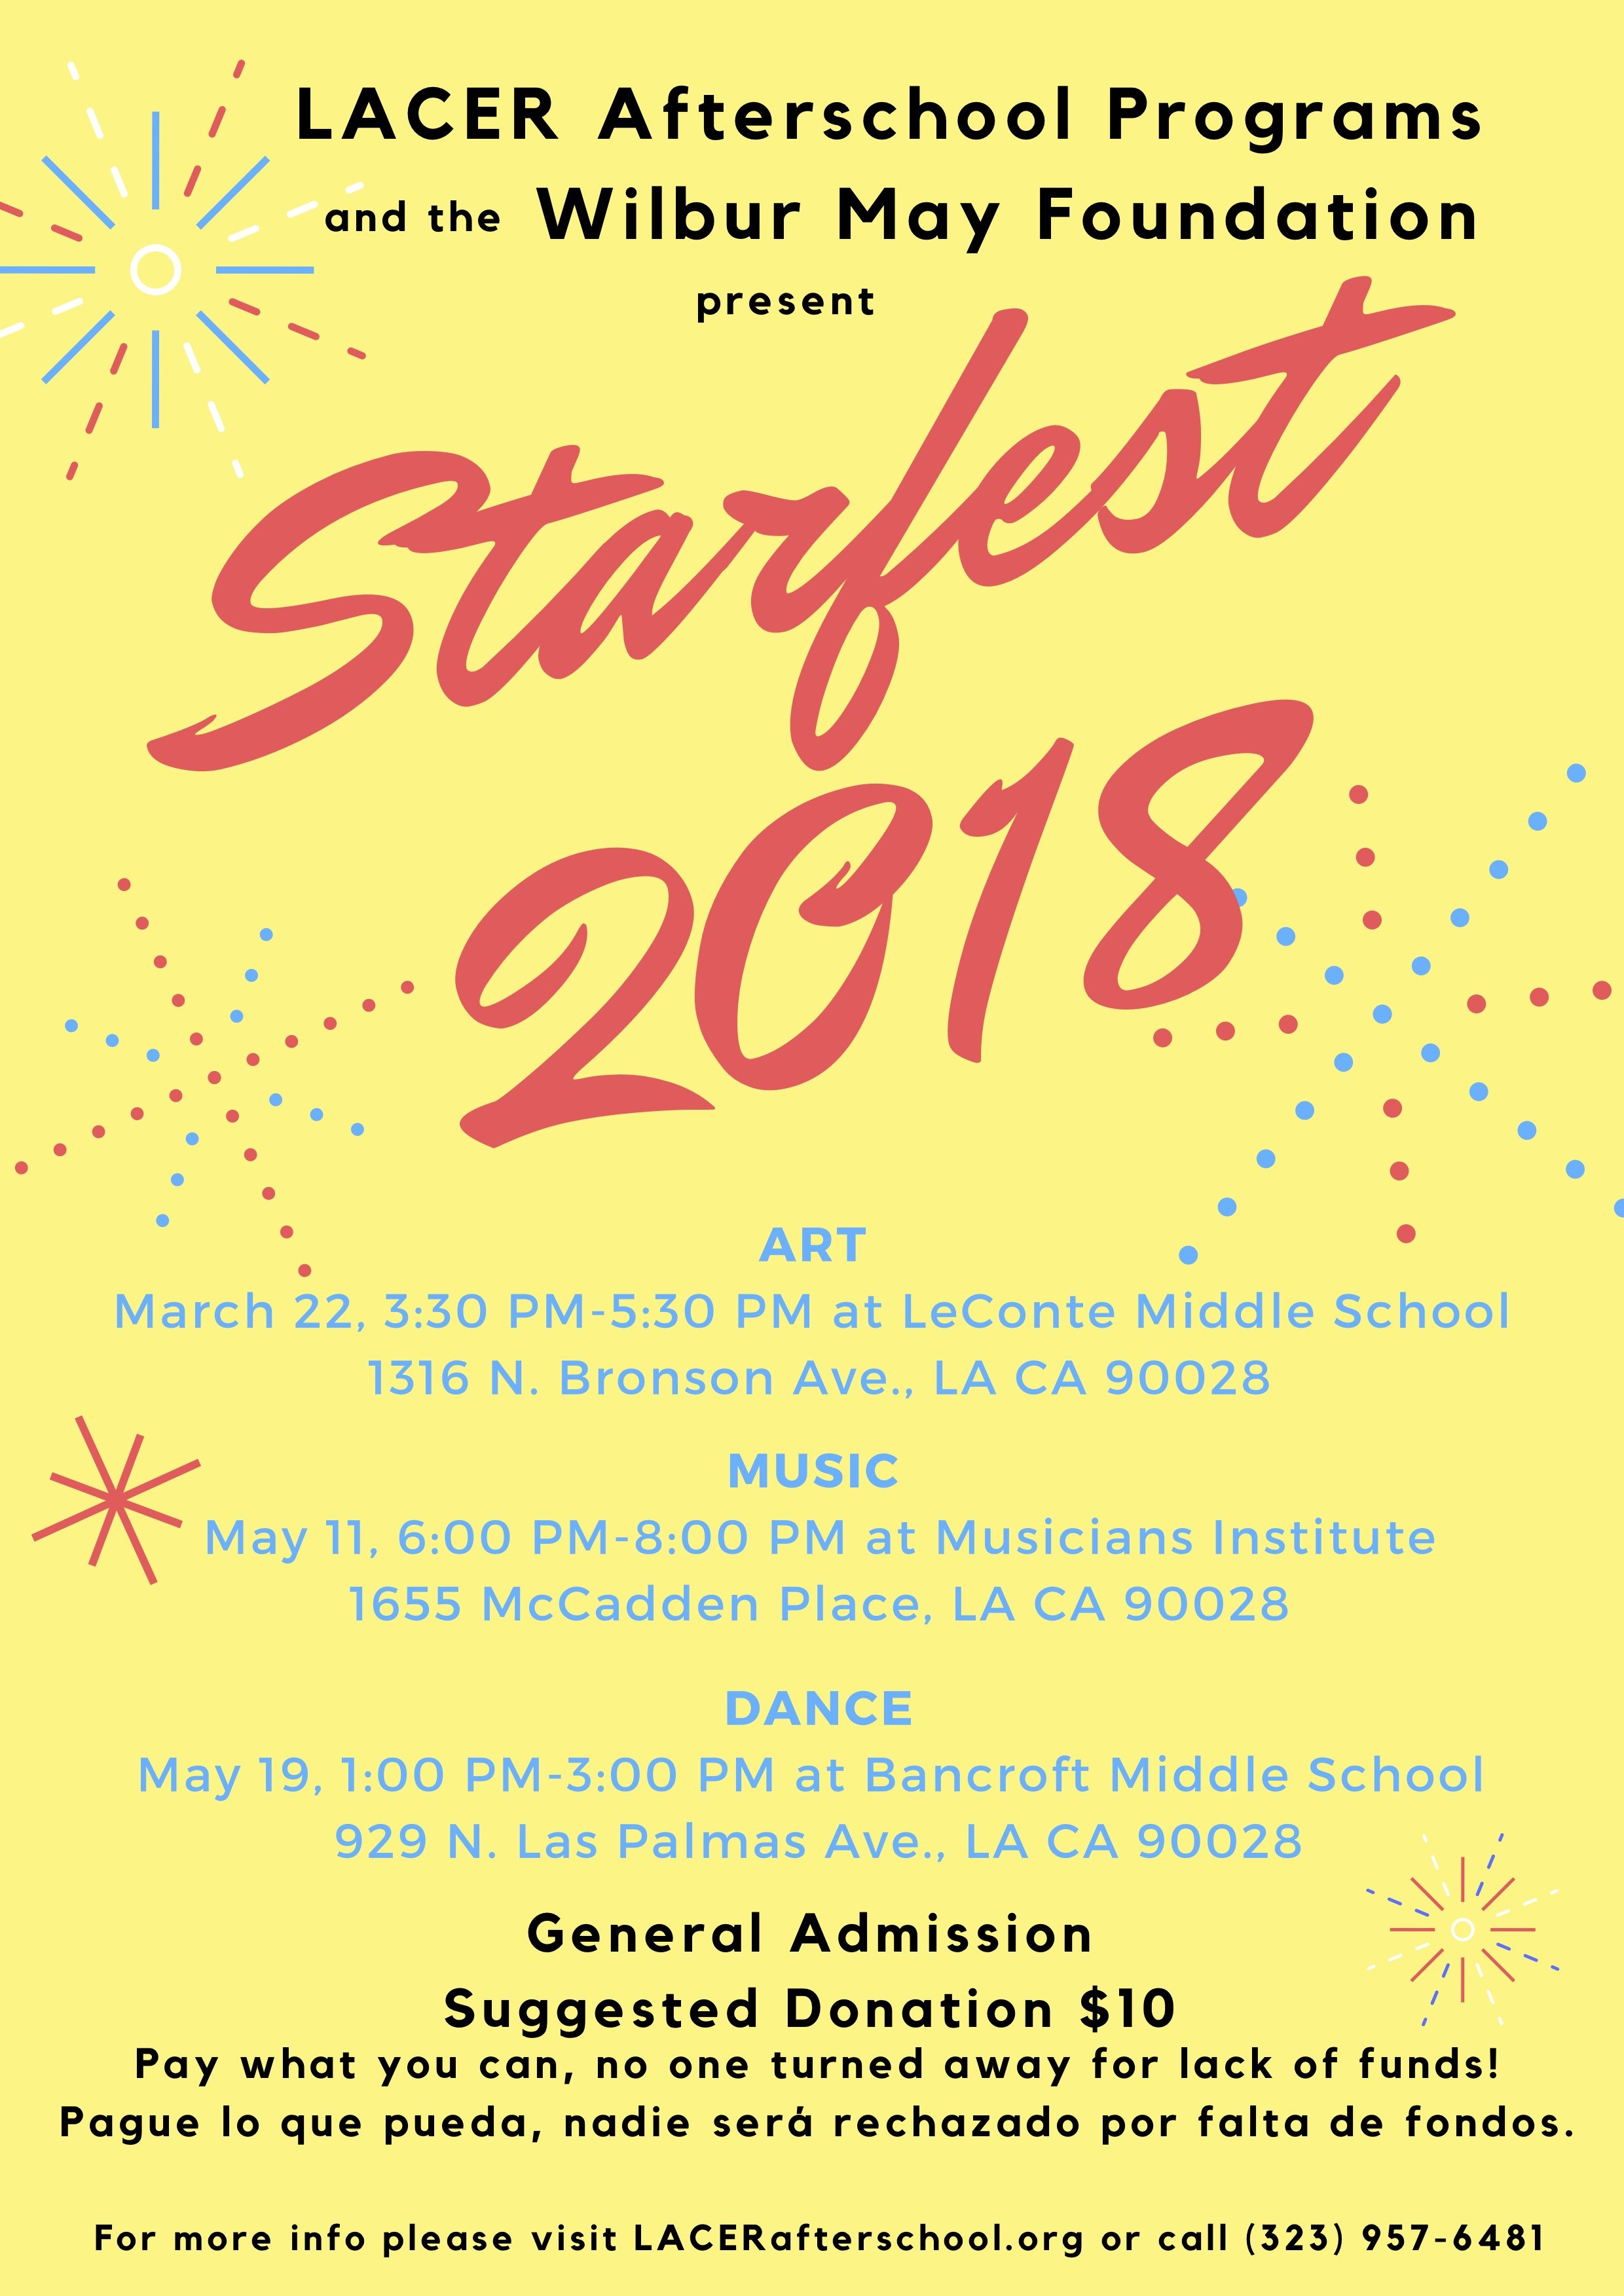 Starfest season 2018 poster FINAL.jpg